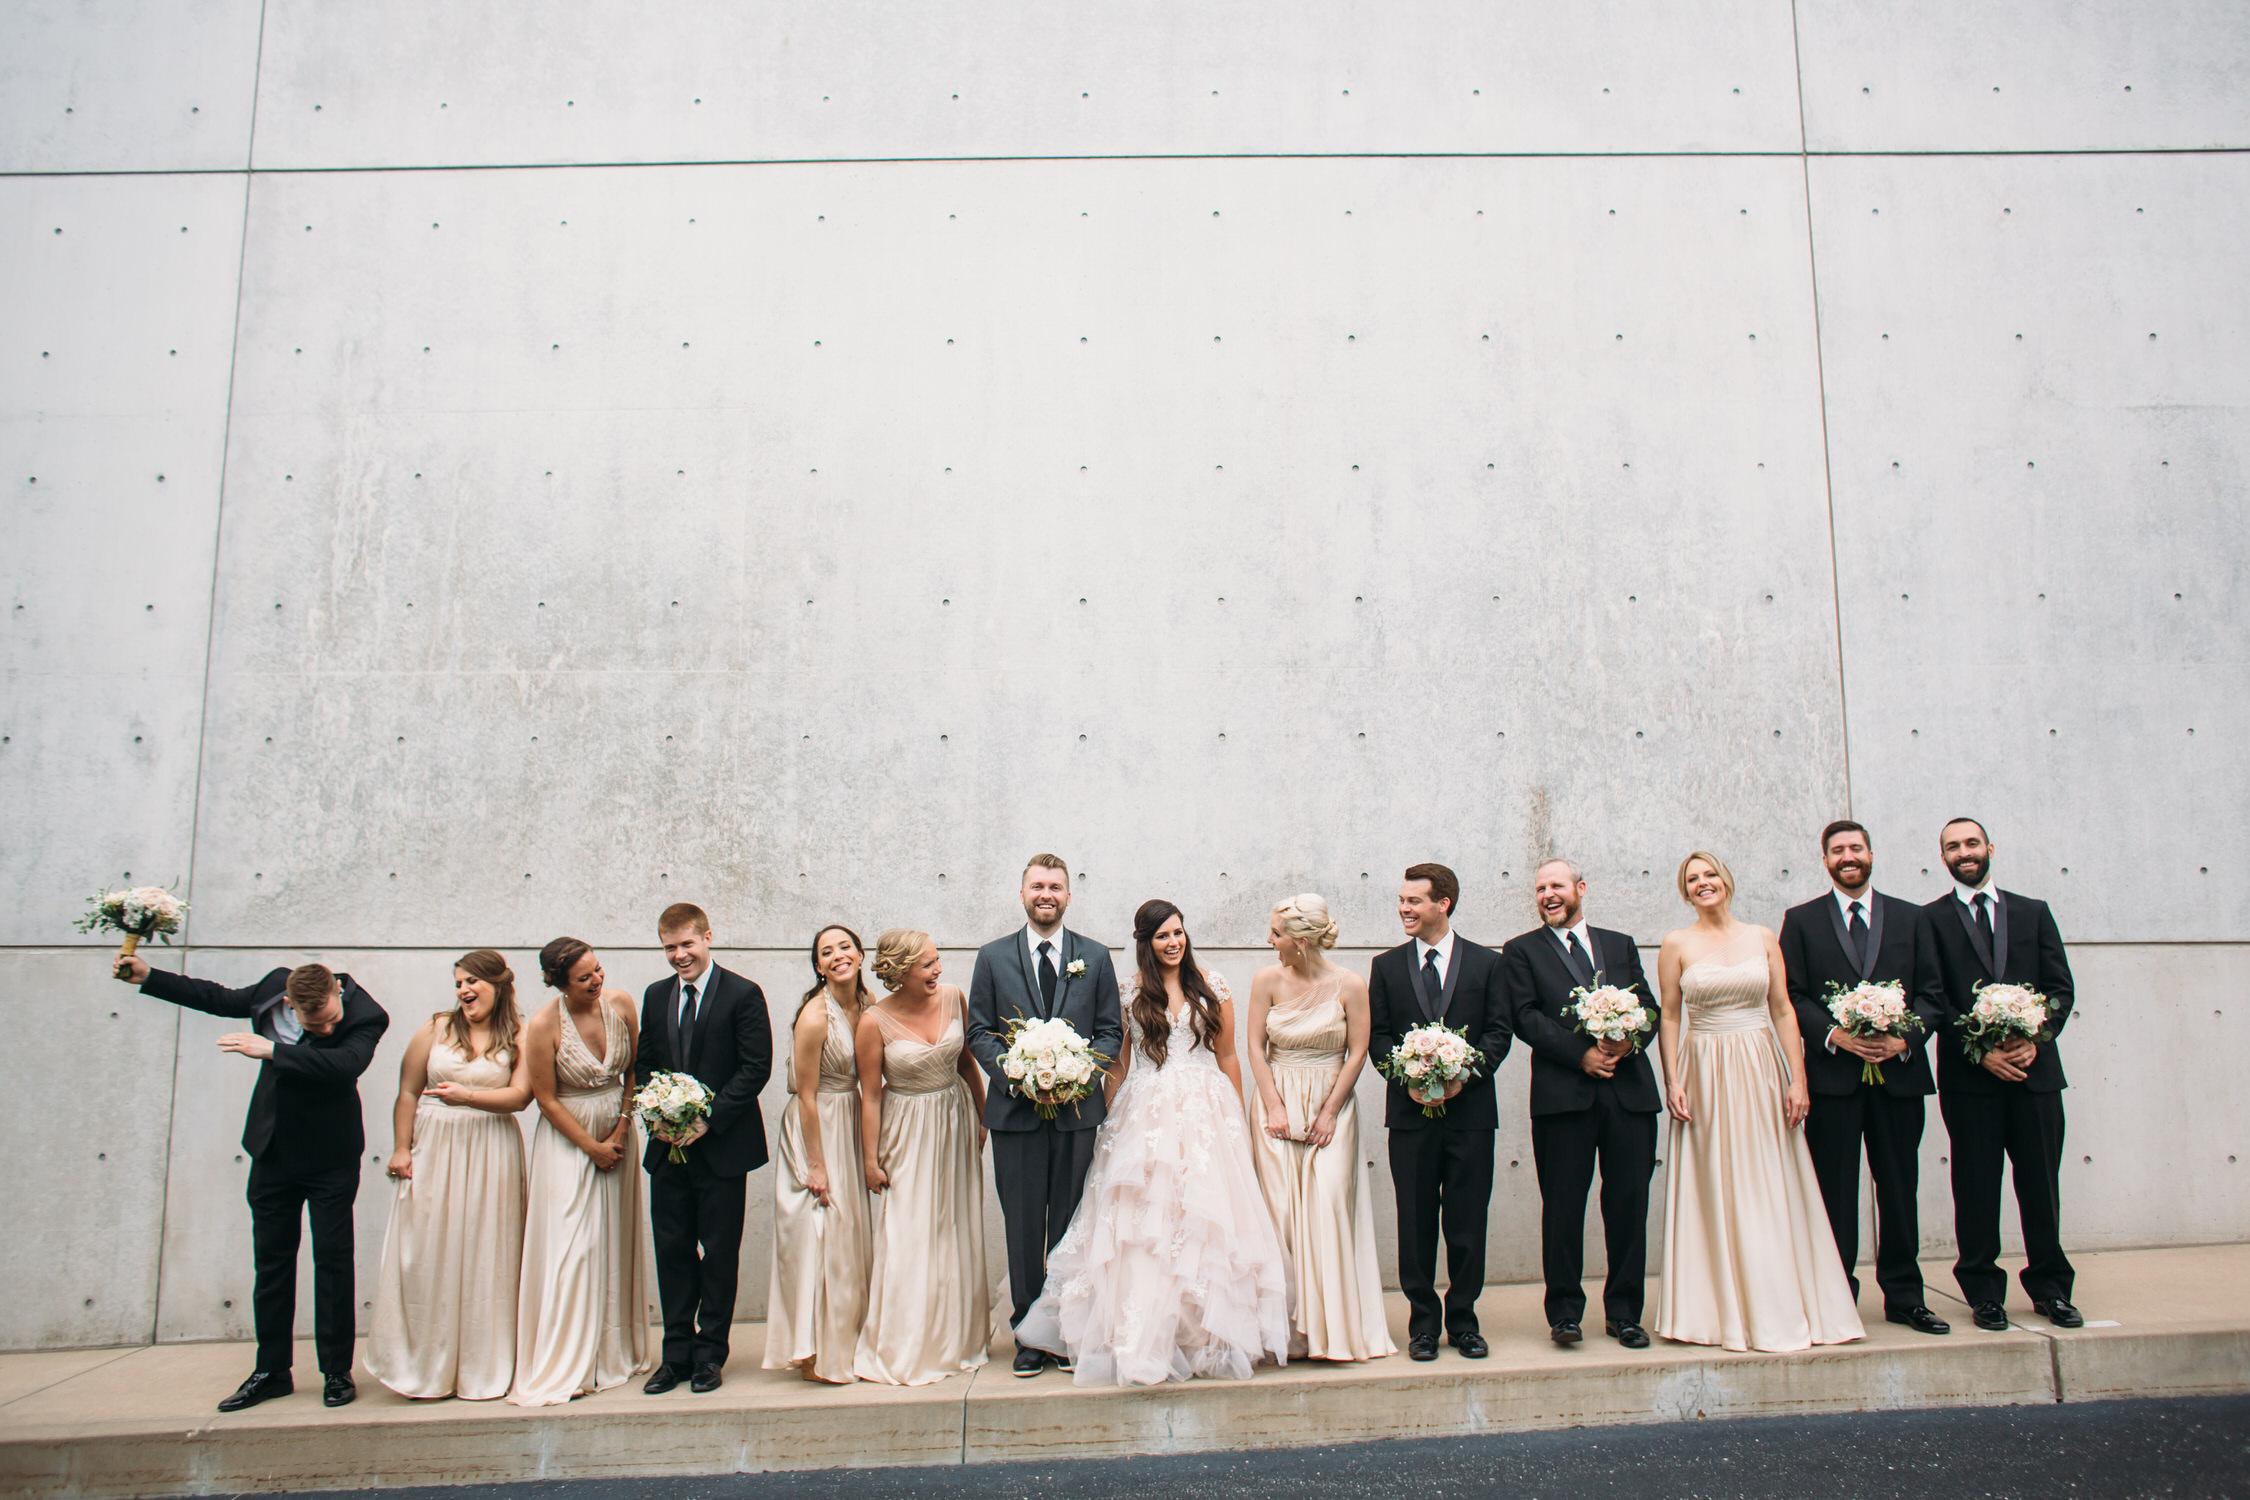 St louis Contemporary Art museum Wedding party